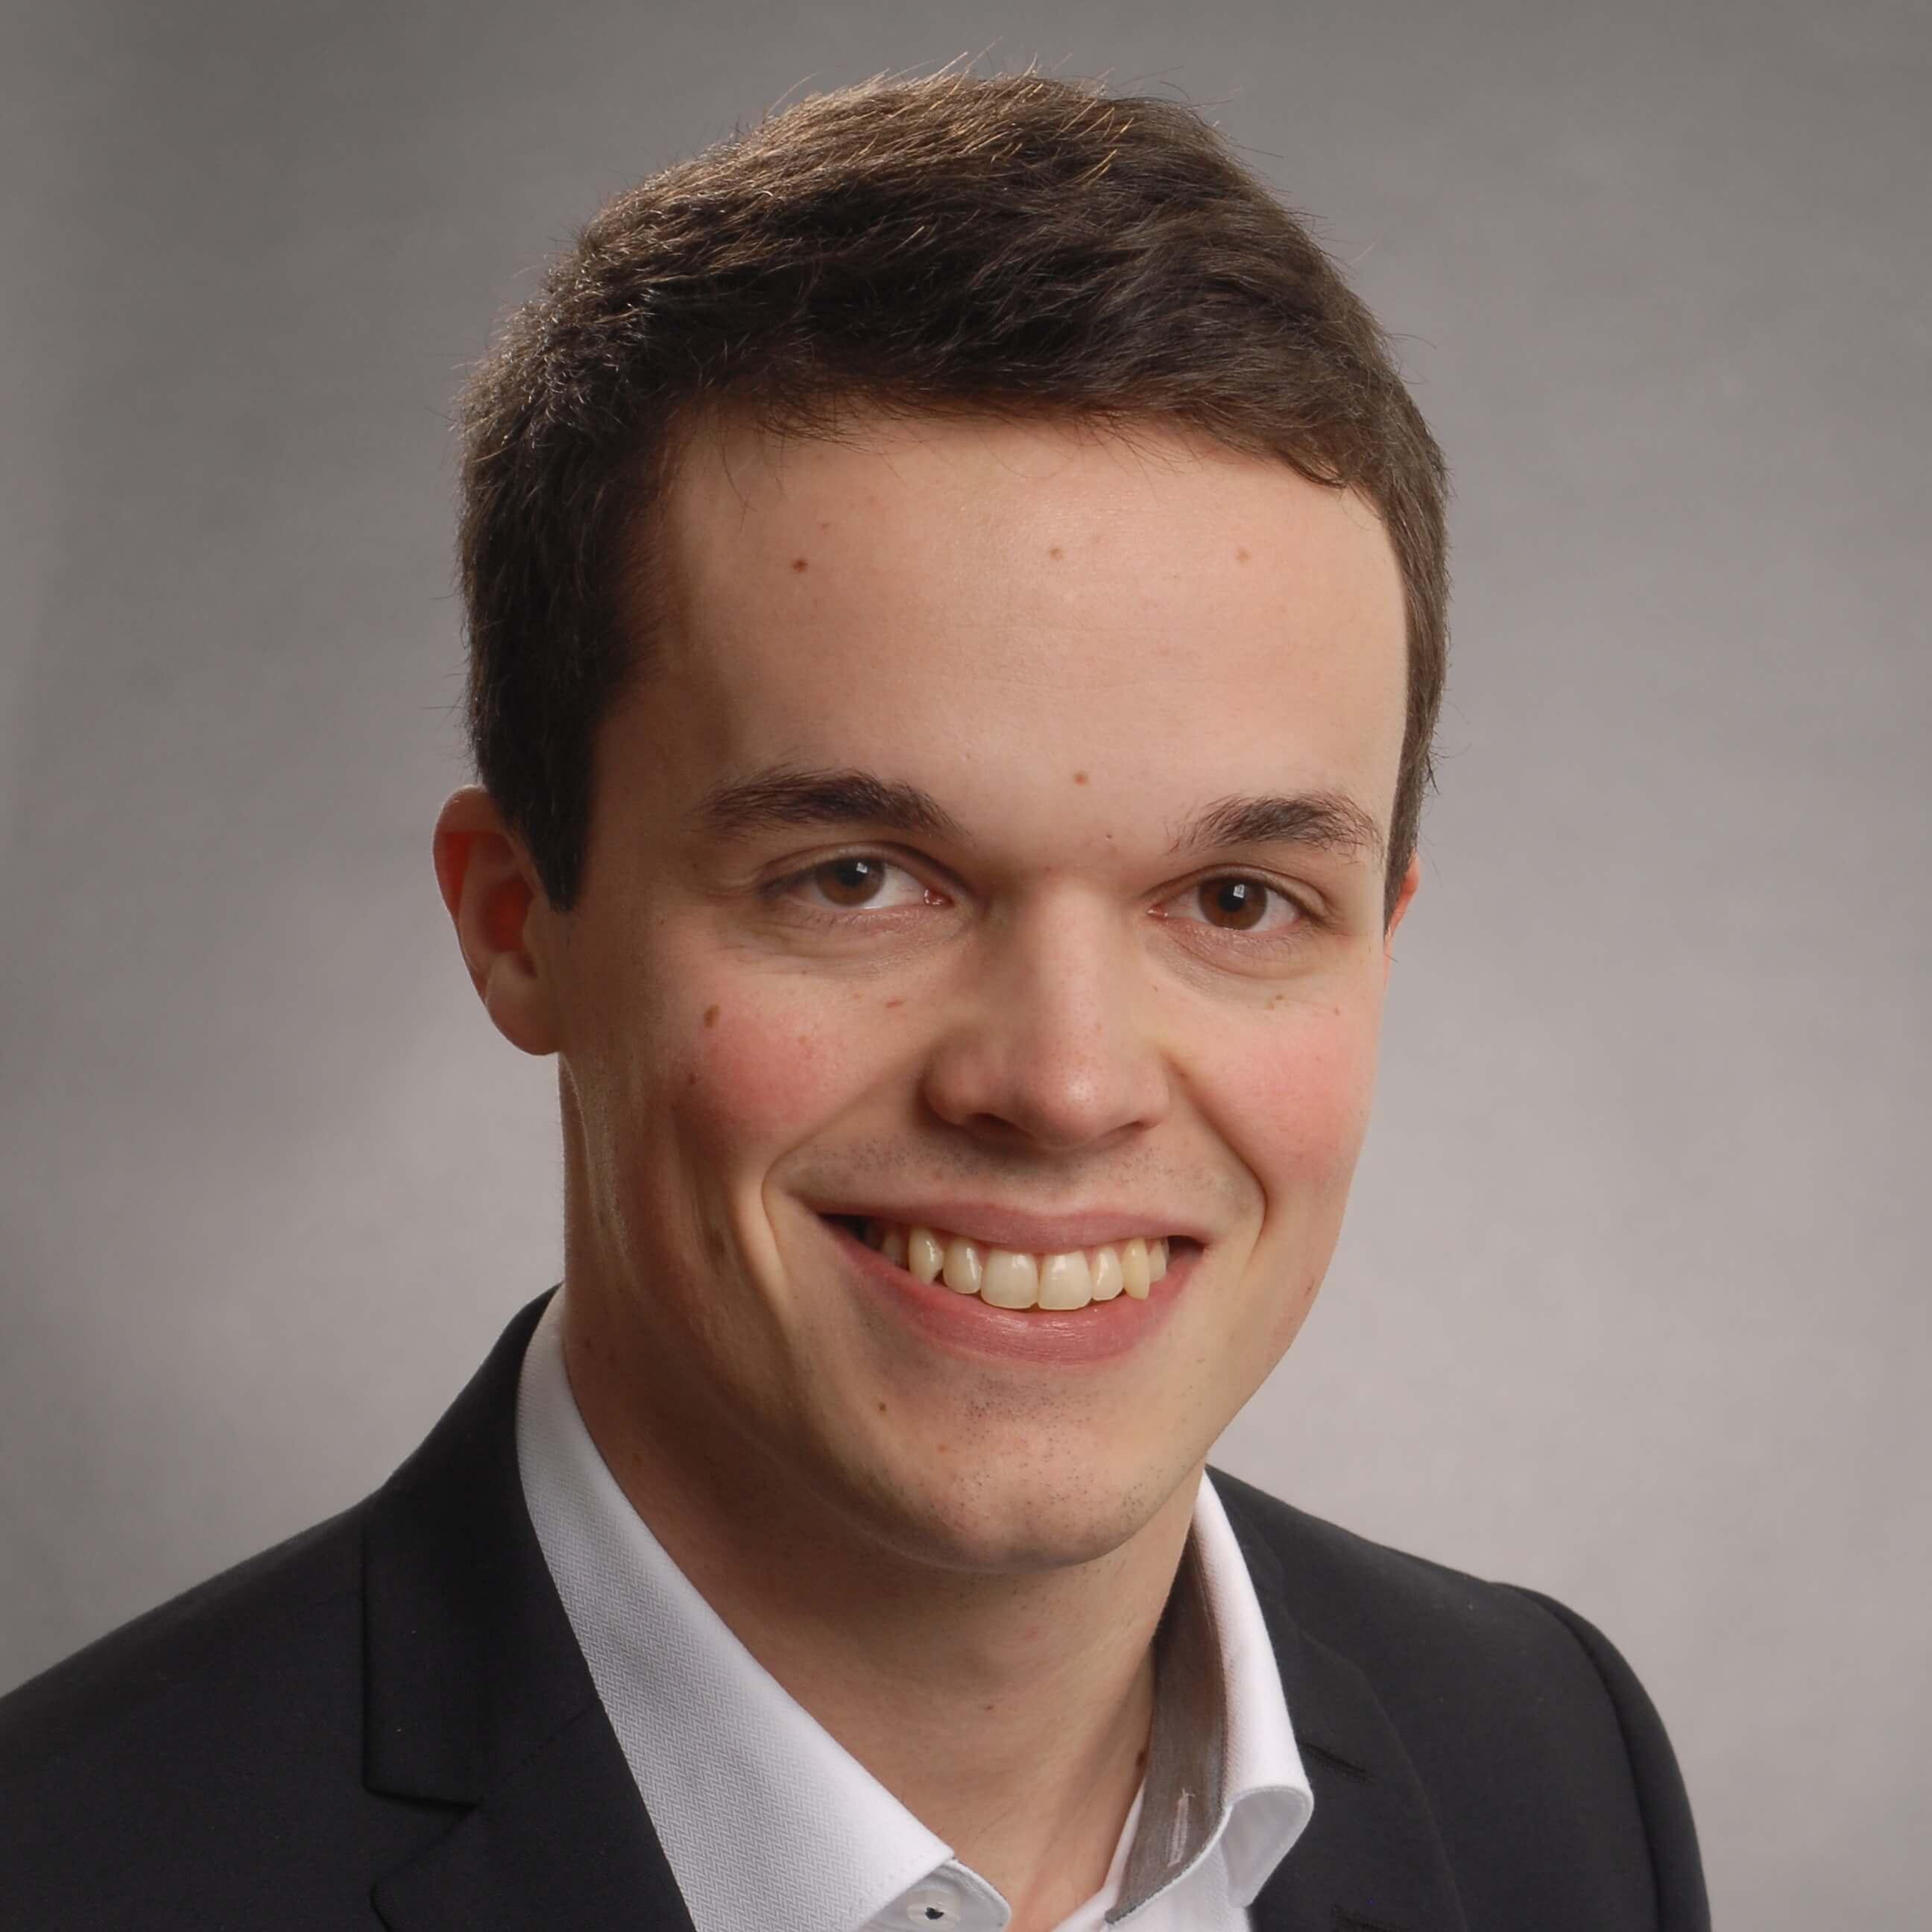 Simon Odorfer